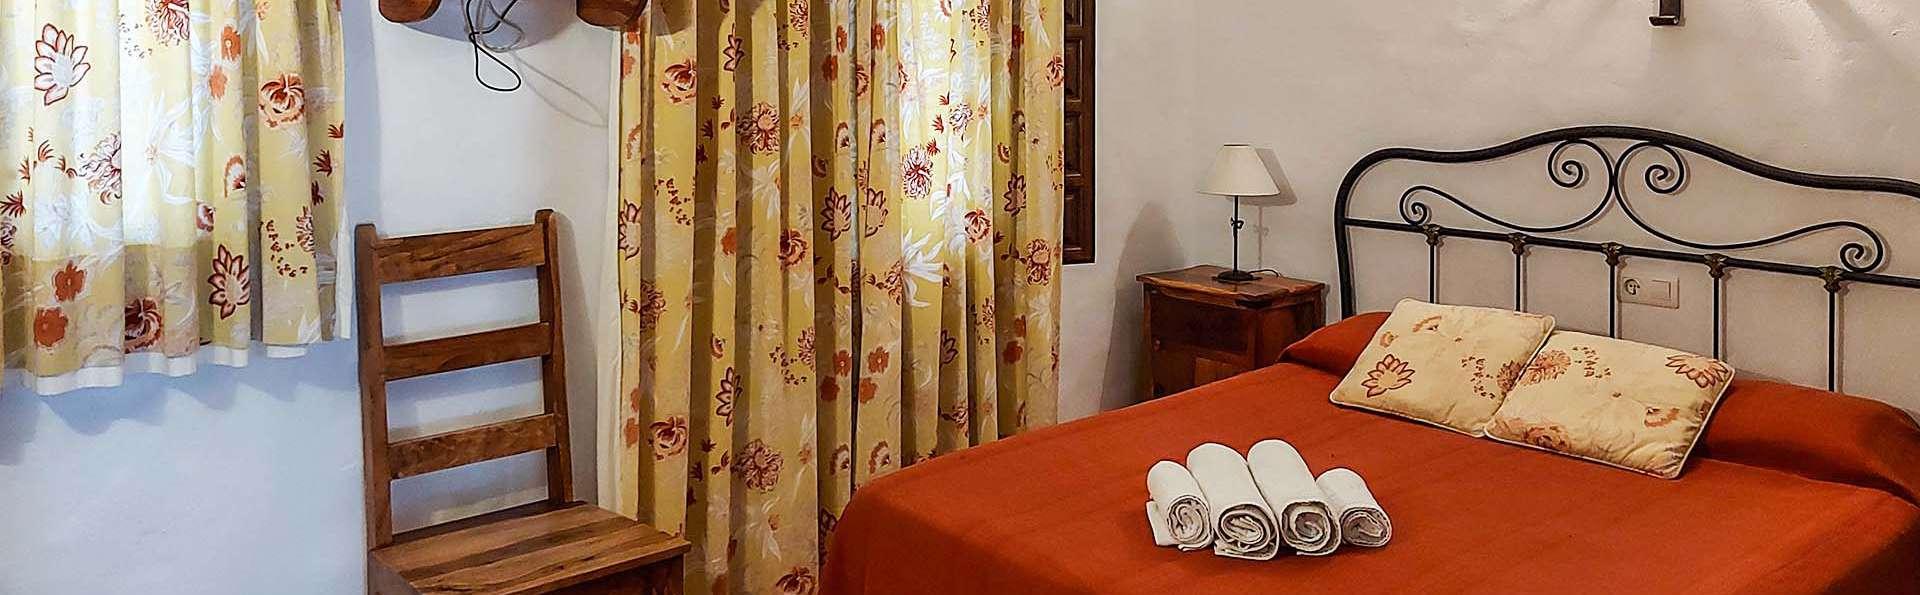 Hotel Posada la Plaza - EDIT_ROOM_03.jpg